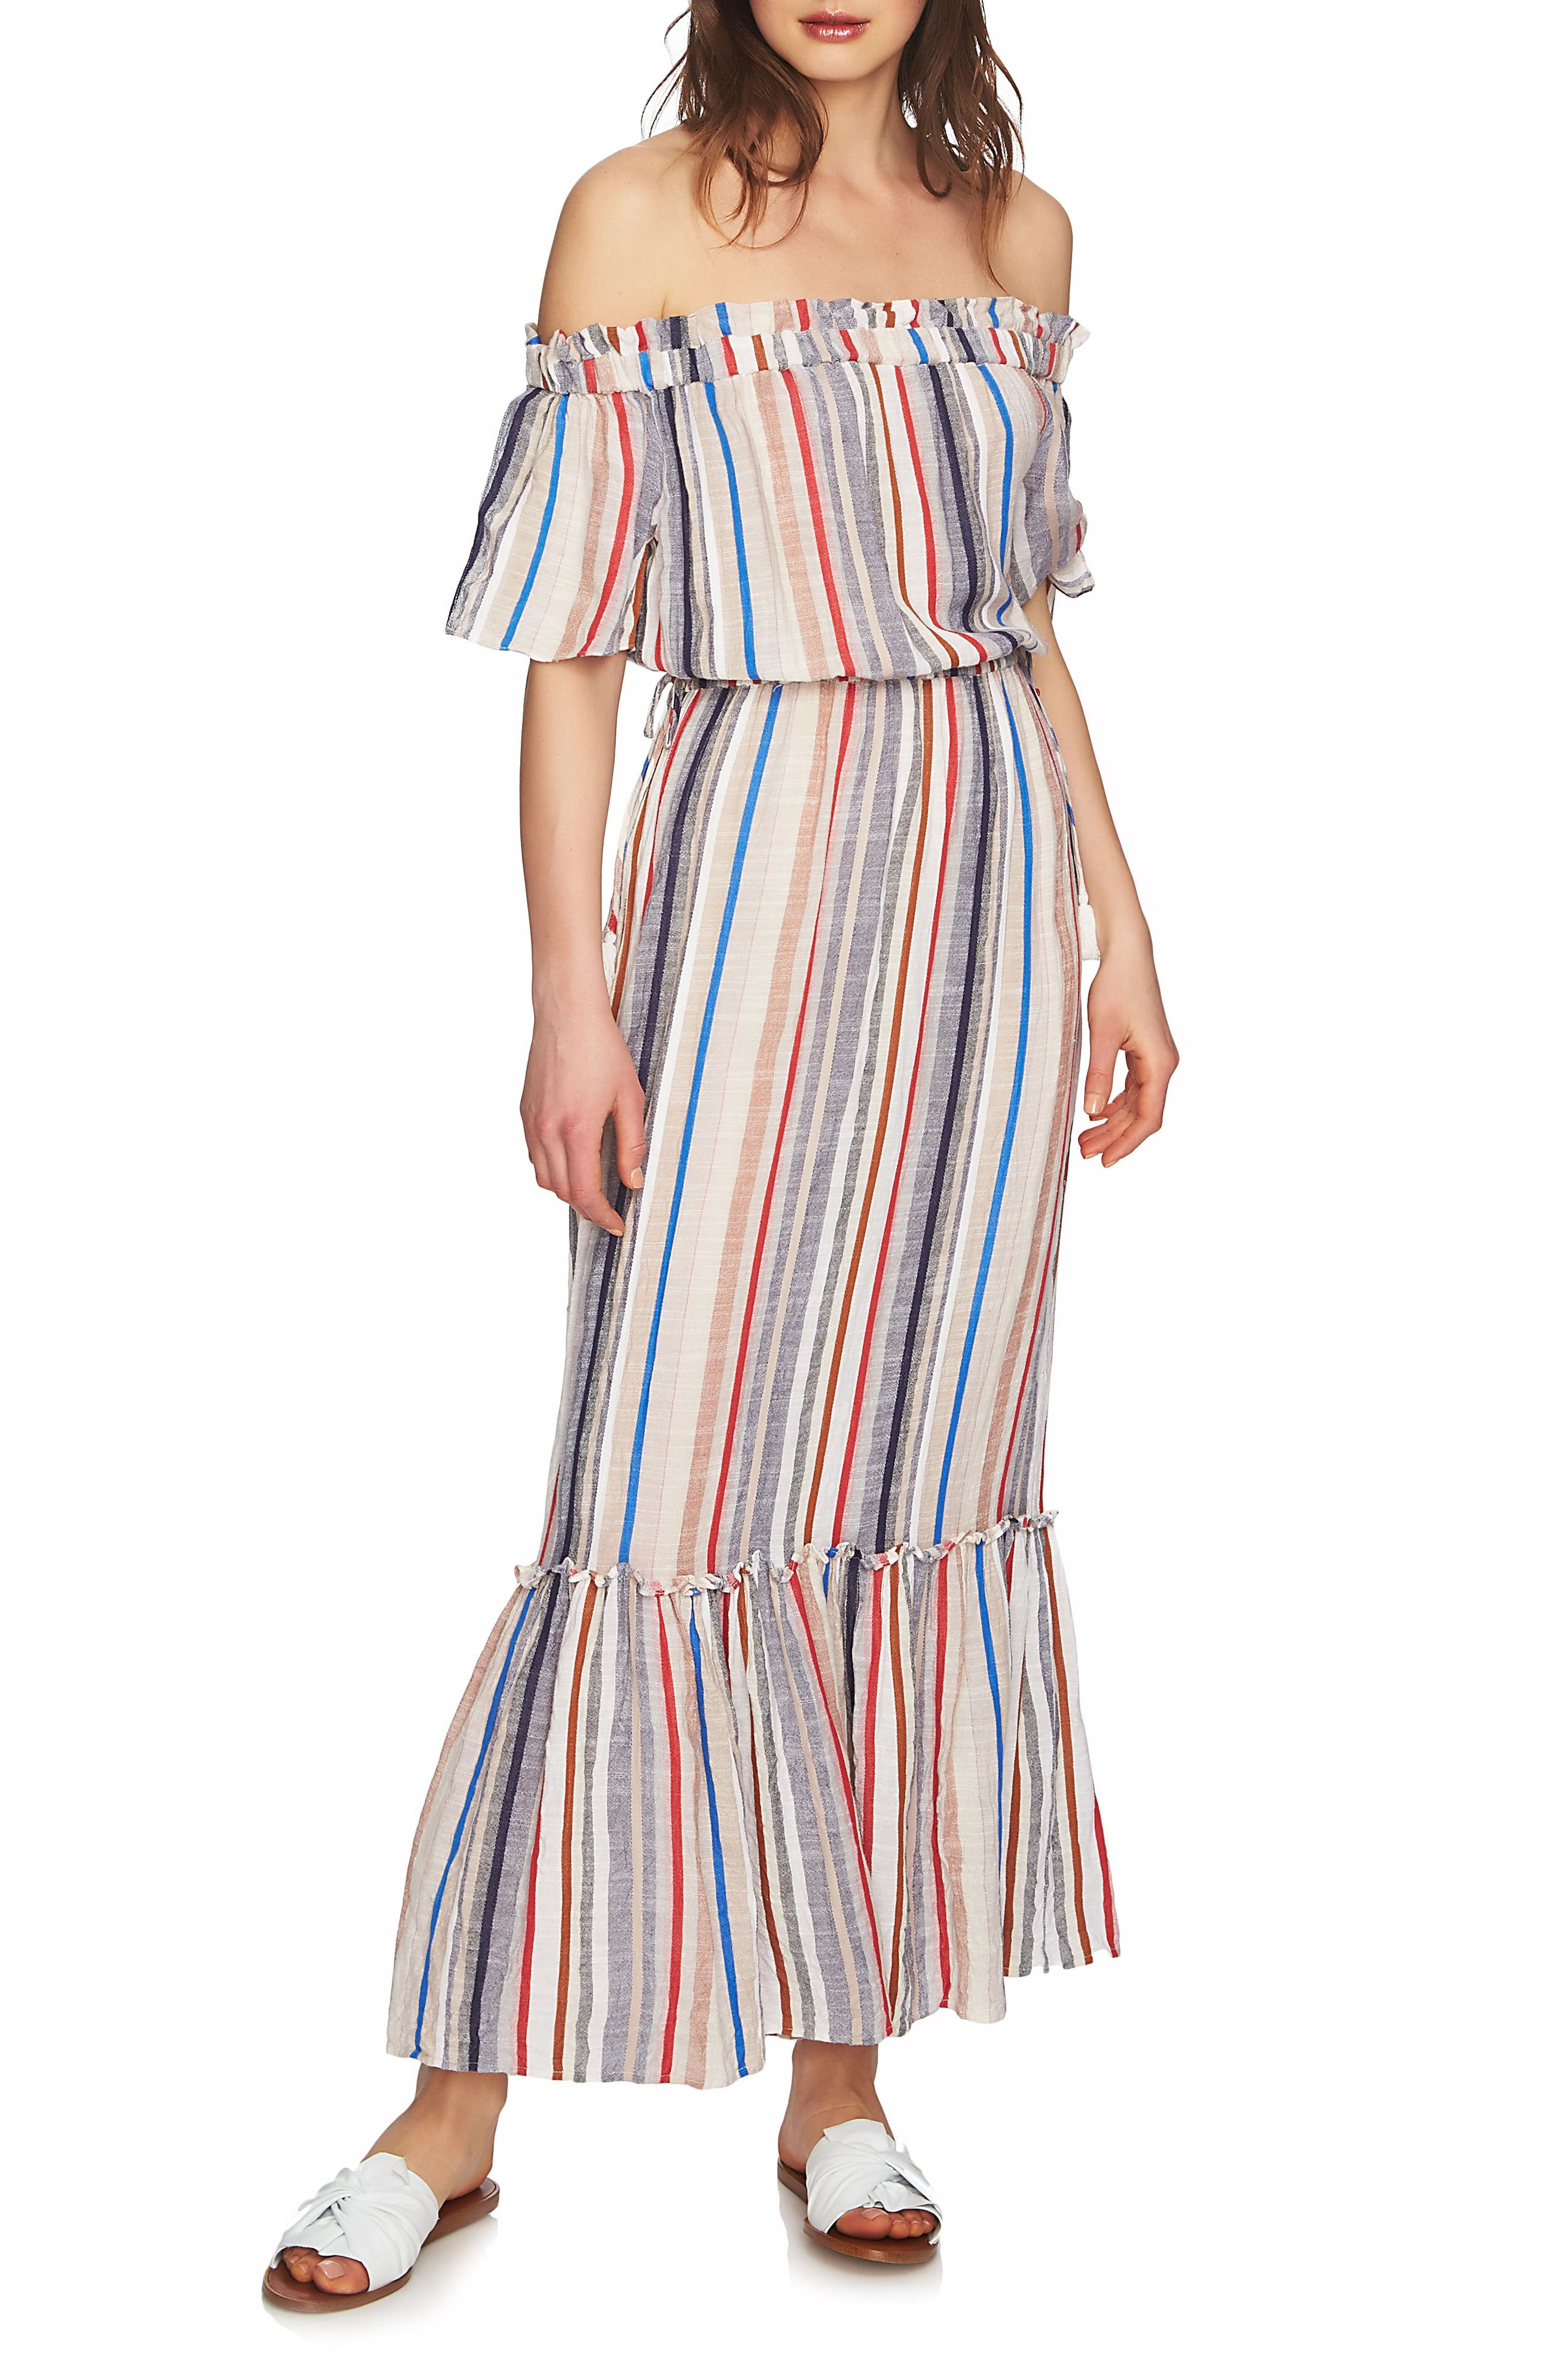 Cinched Waist Off the Shoulder Maxi Dress